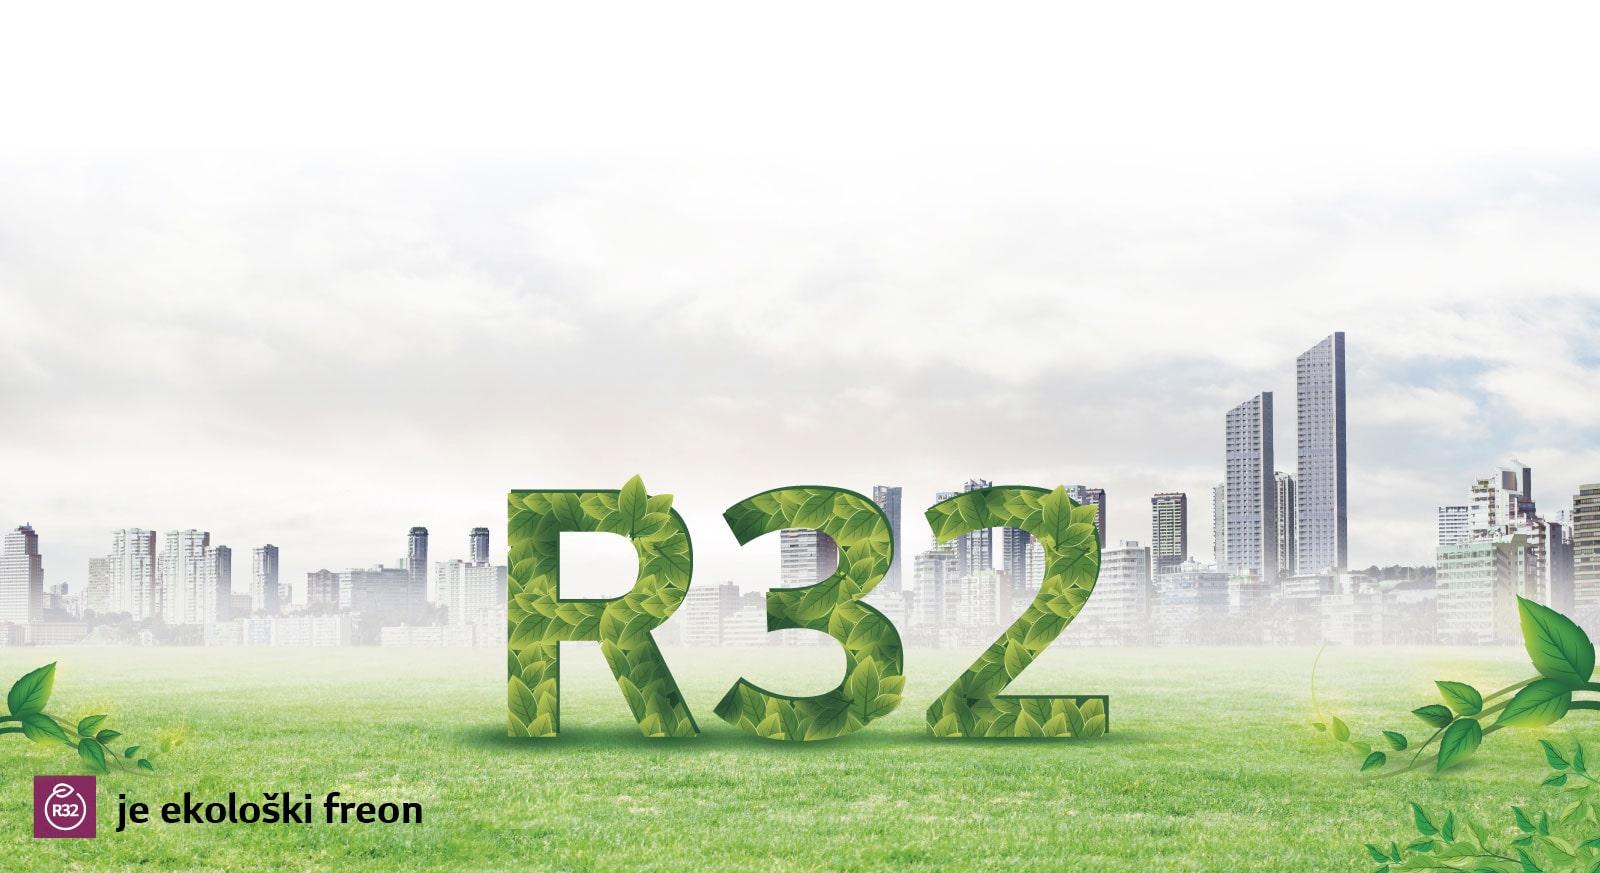 https://www.lg.com/rs/images/AC/features/R32-02_Desktop-6_F.jpg